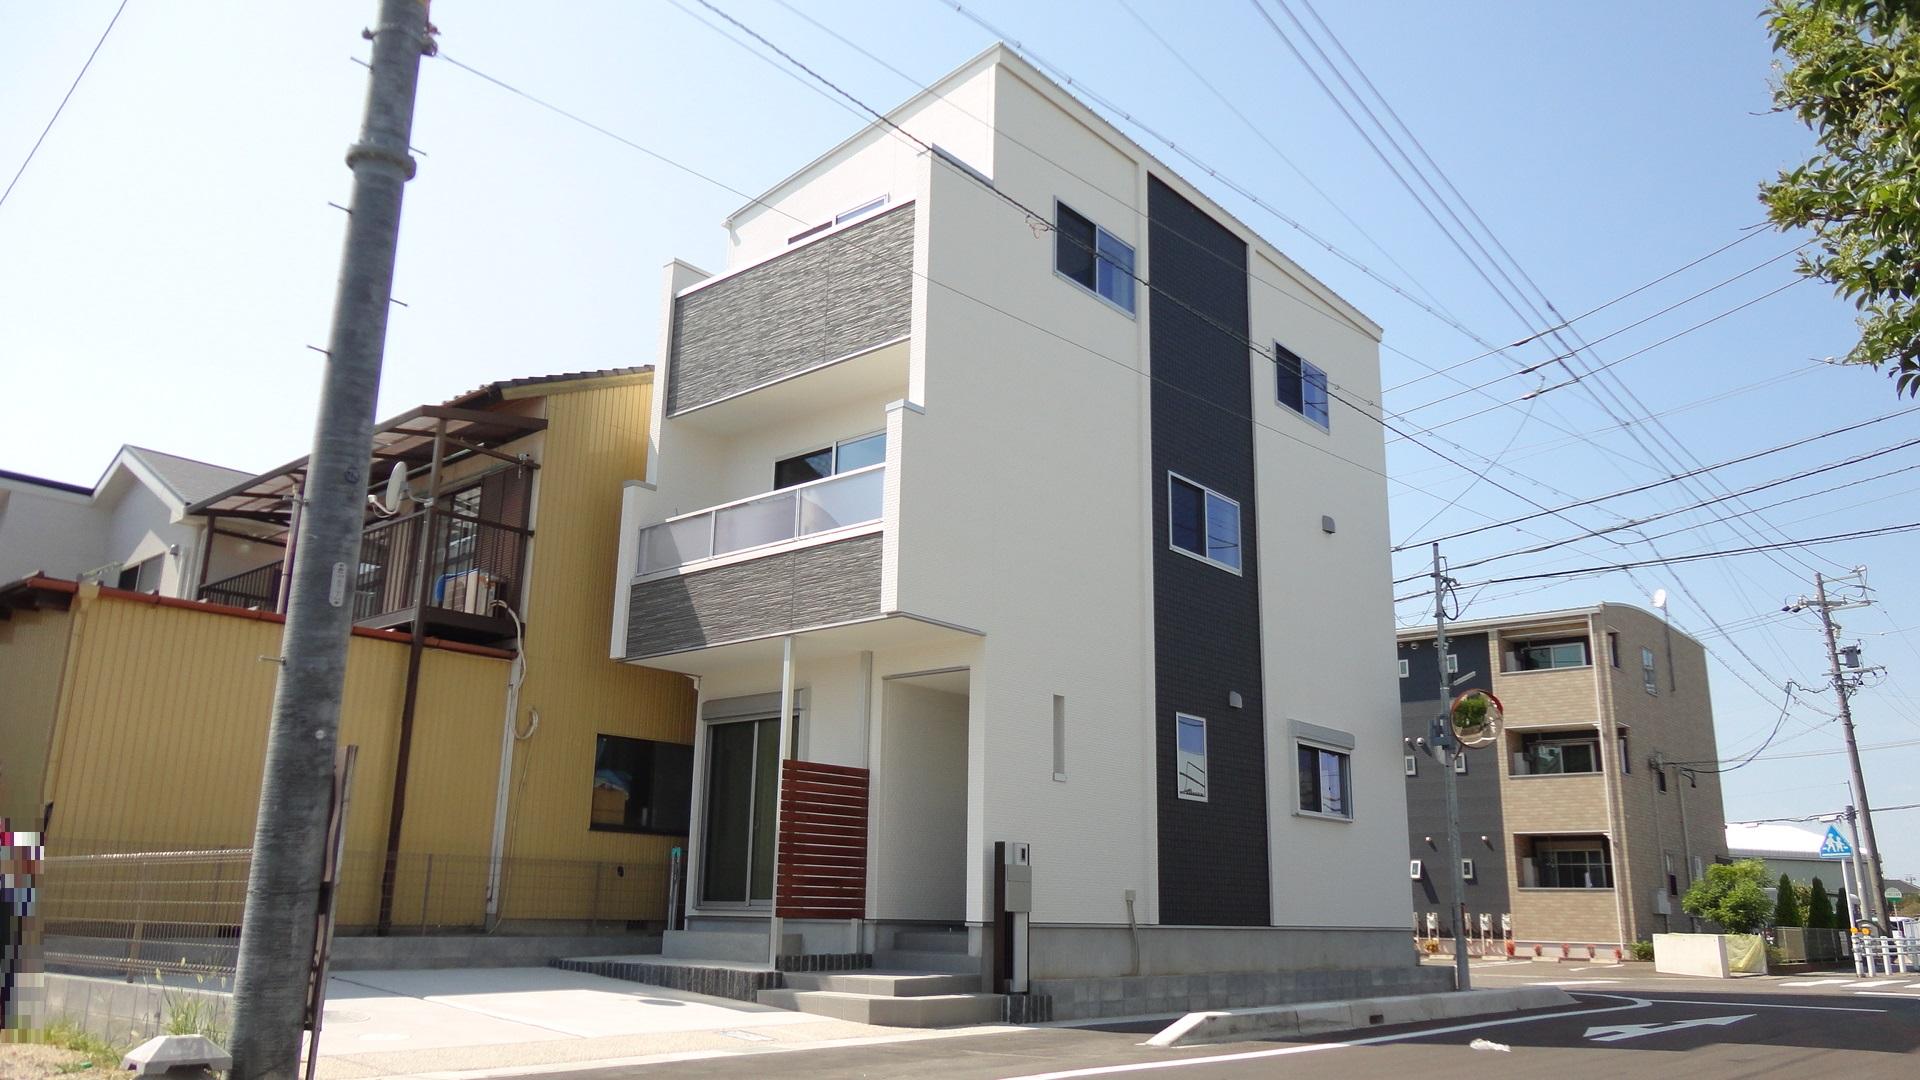 東入 4LDK 木造3階建て 34.25坪 間口16818mm